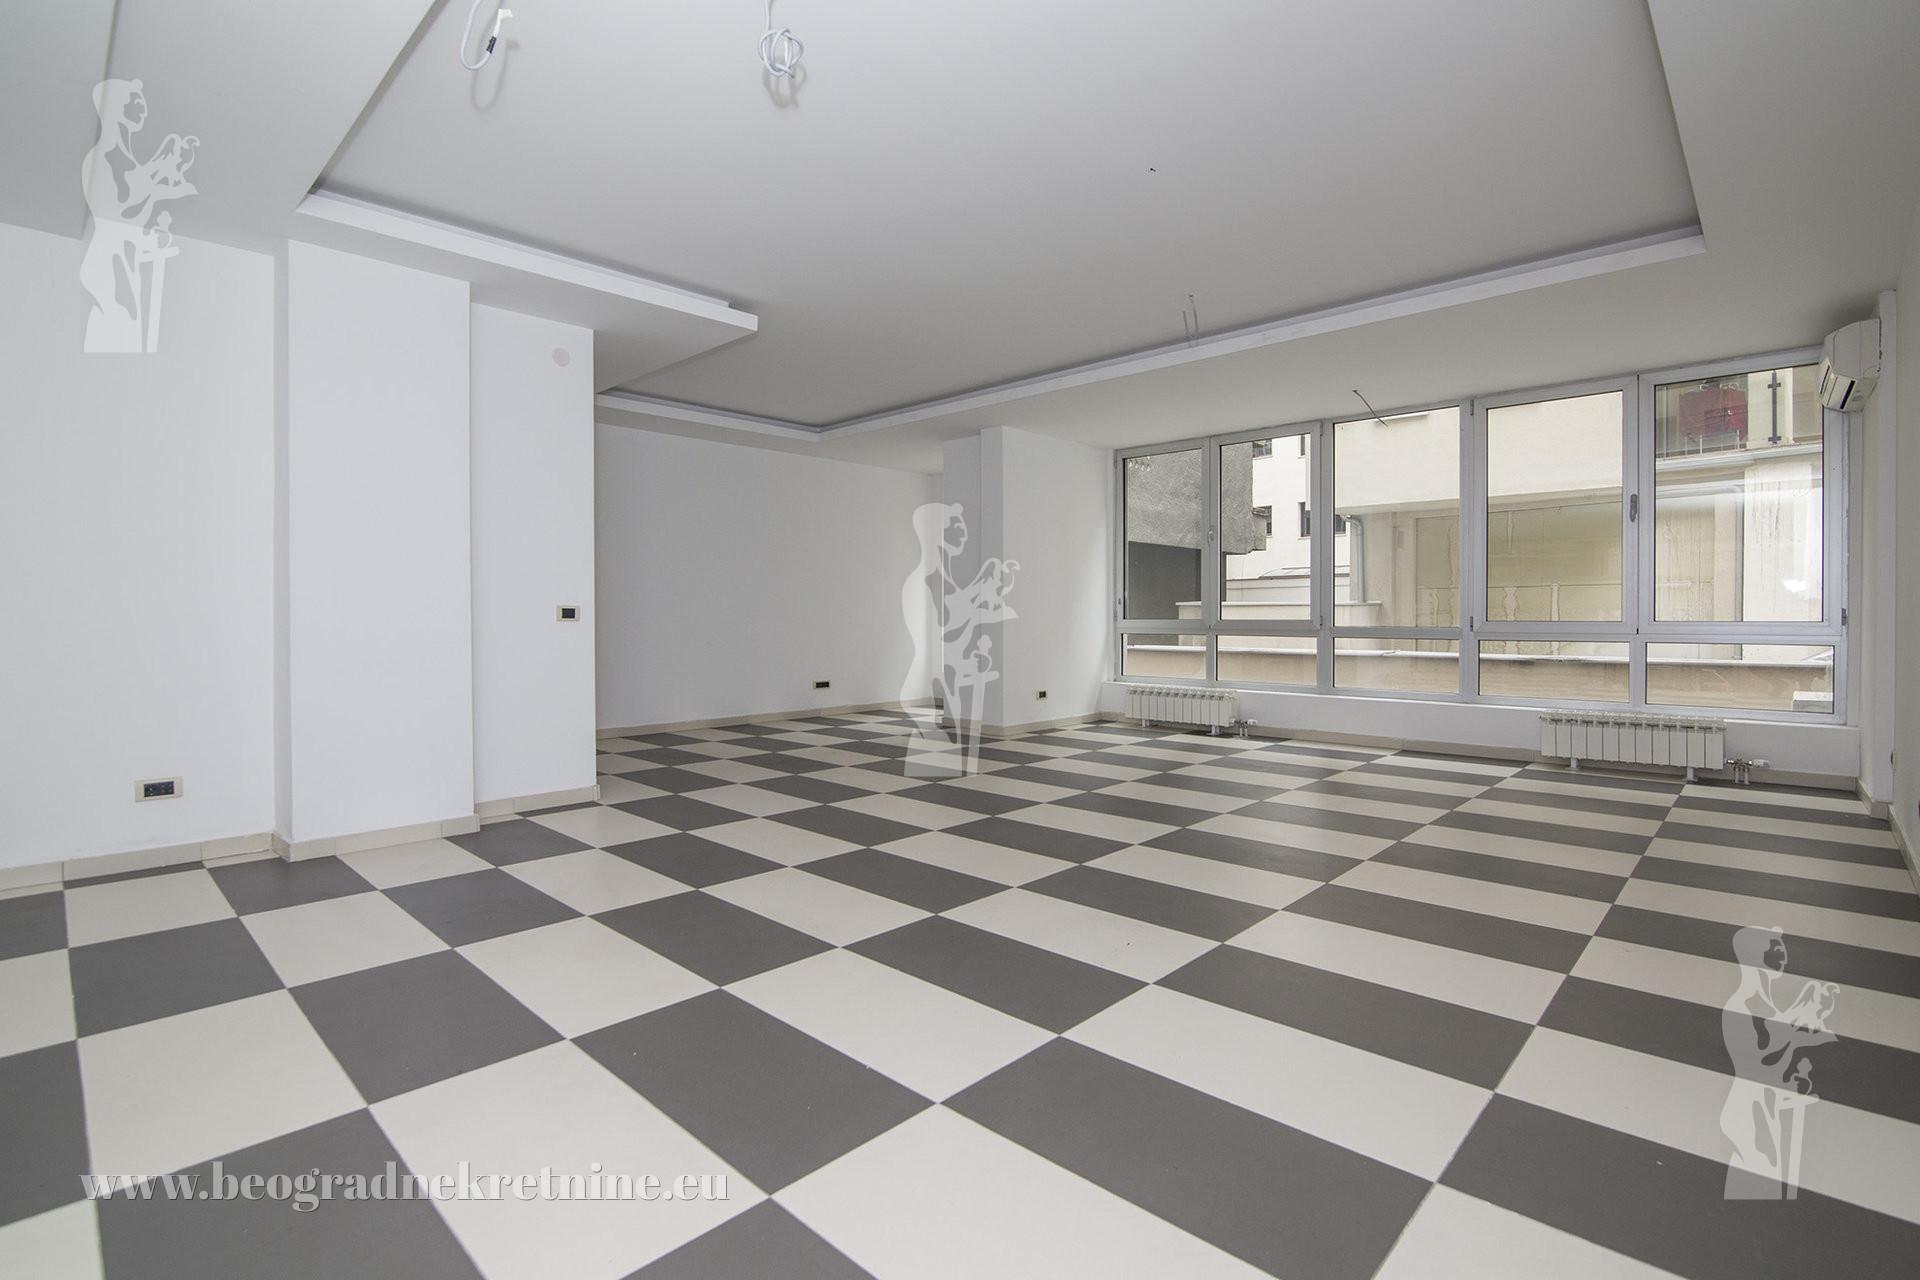 Poslovni prostor 140 m2 Kalenić